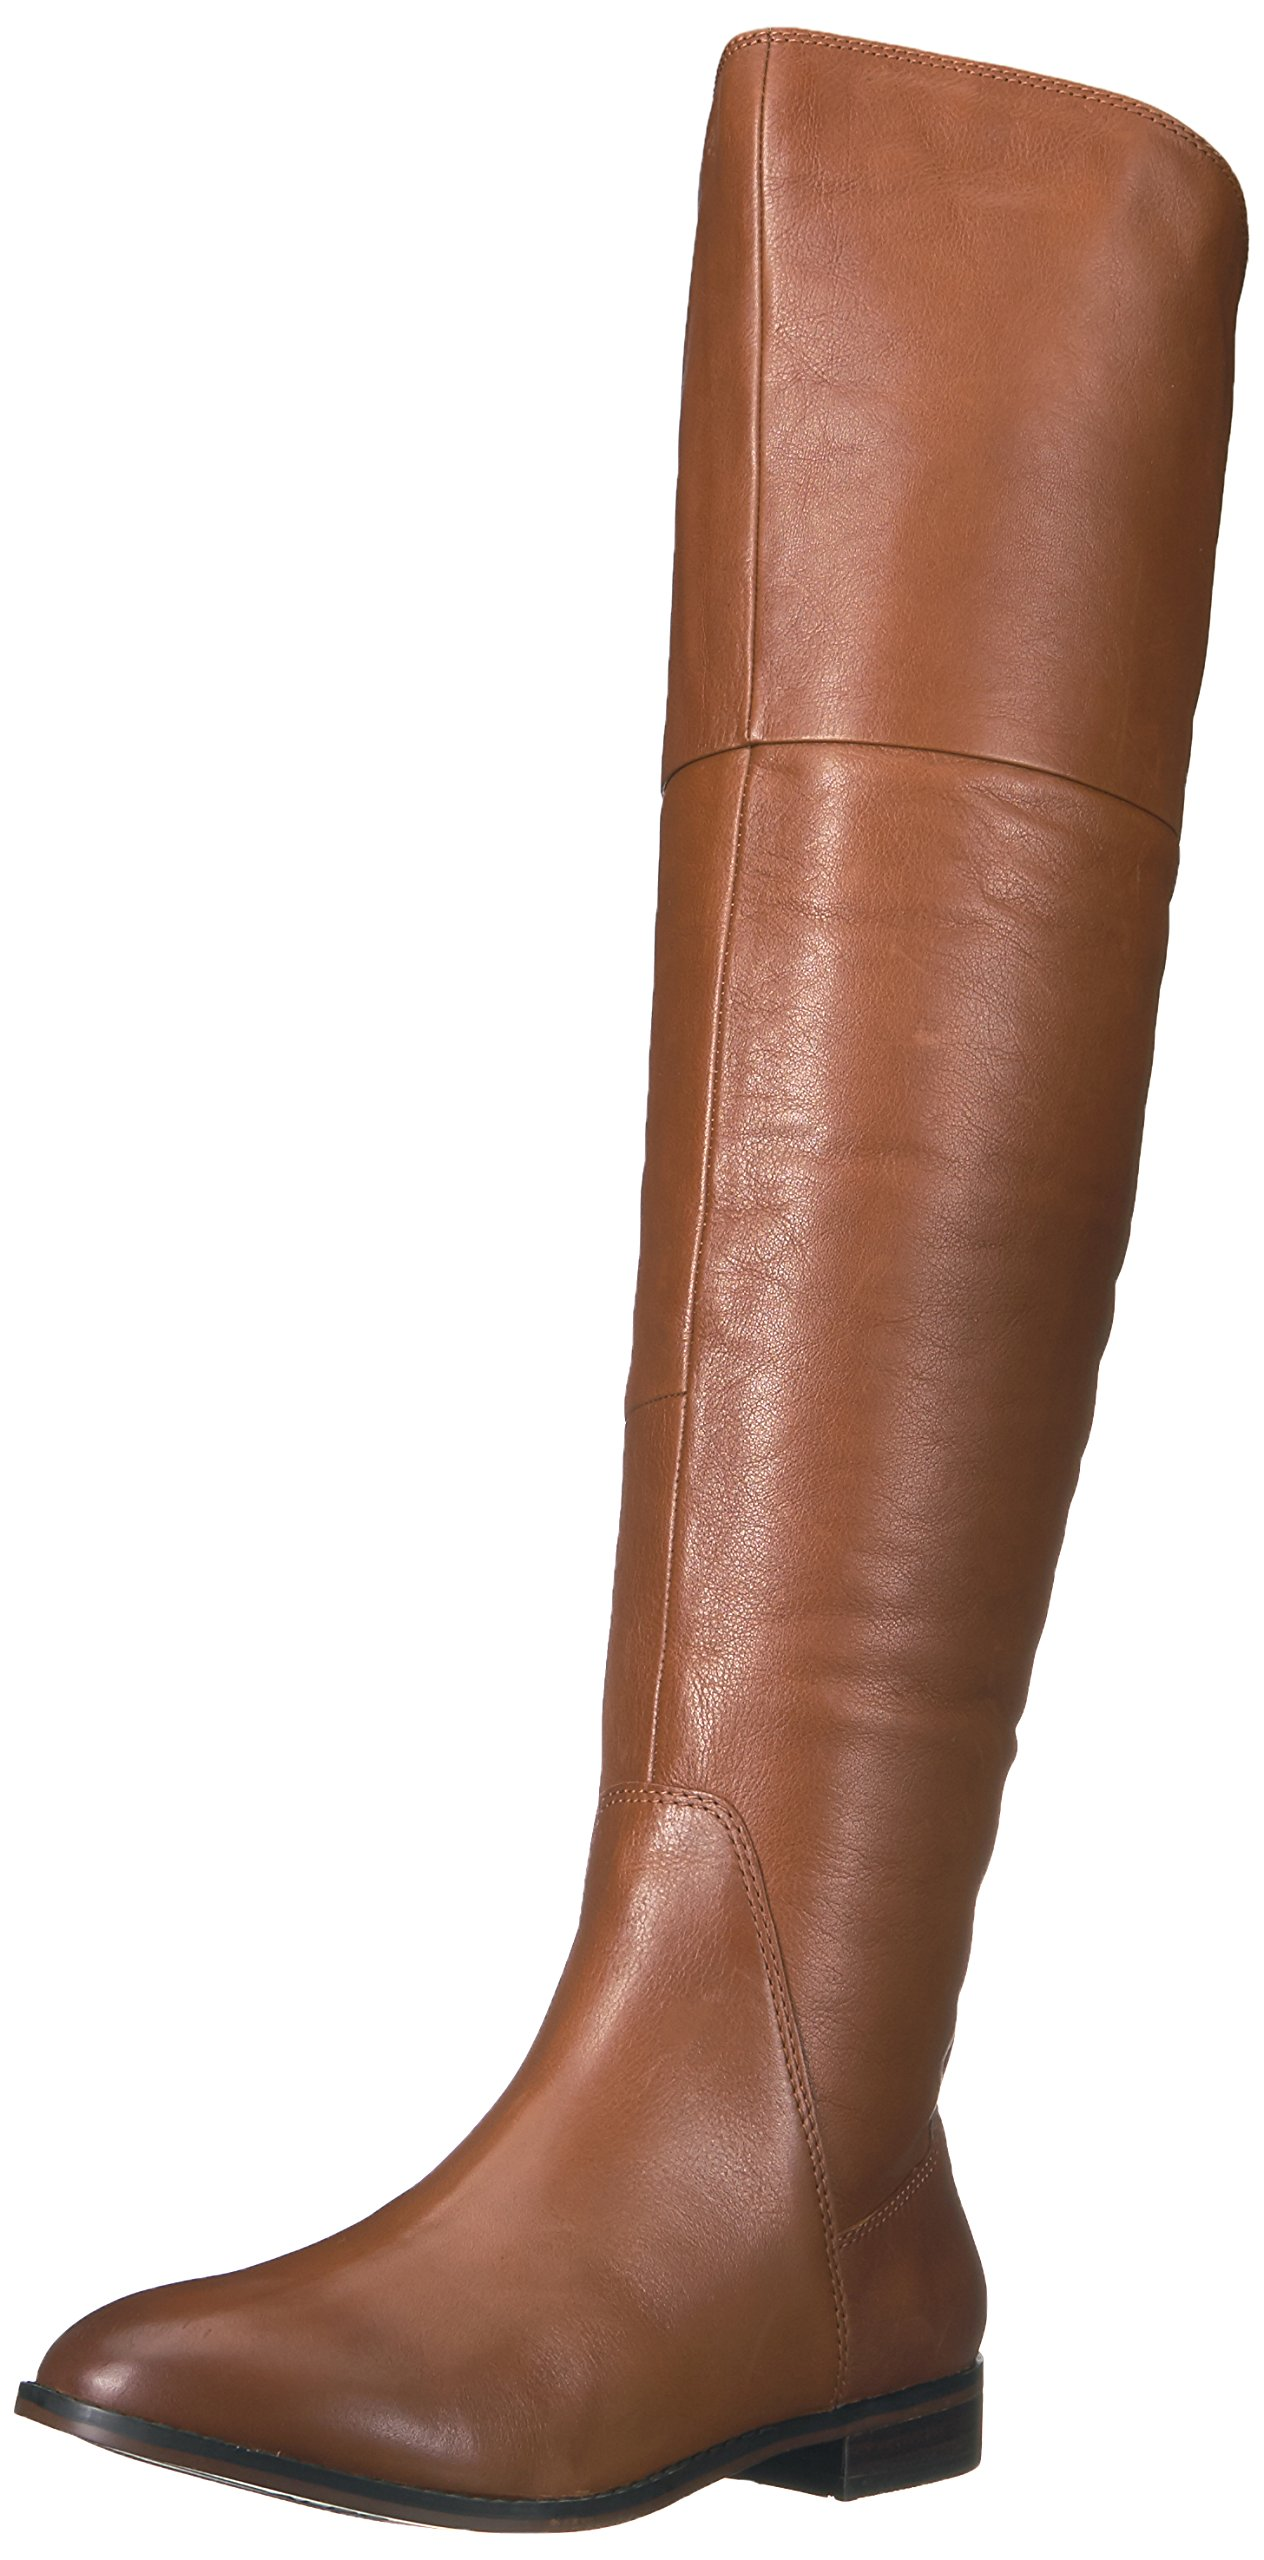 Aldo Women's Fudge Riding Boot, Cognac, 7.5 B US